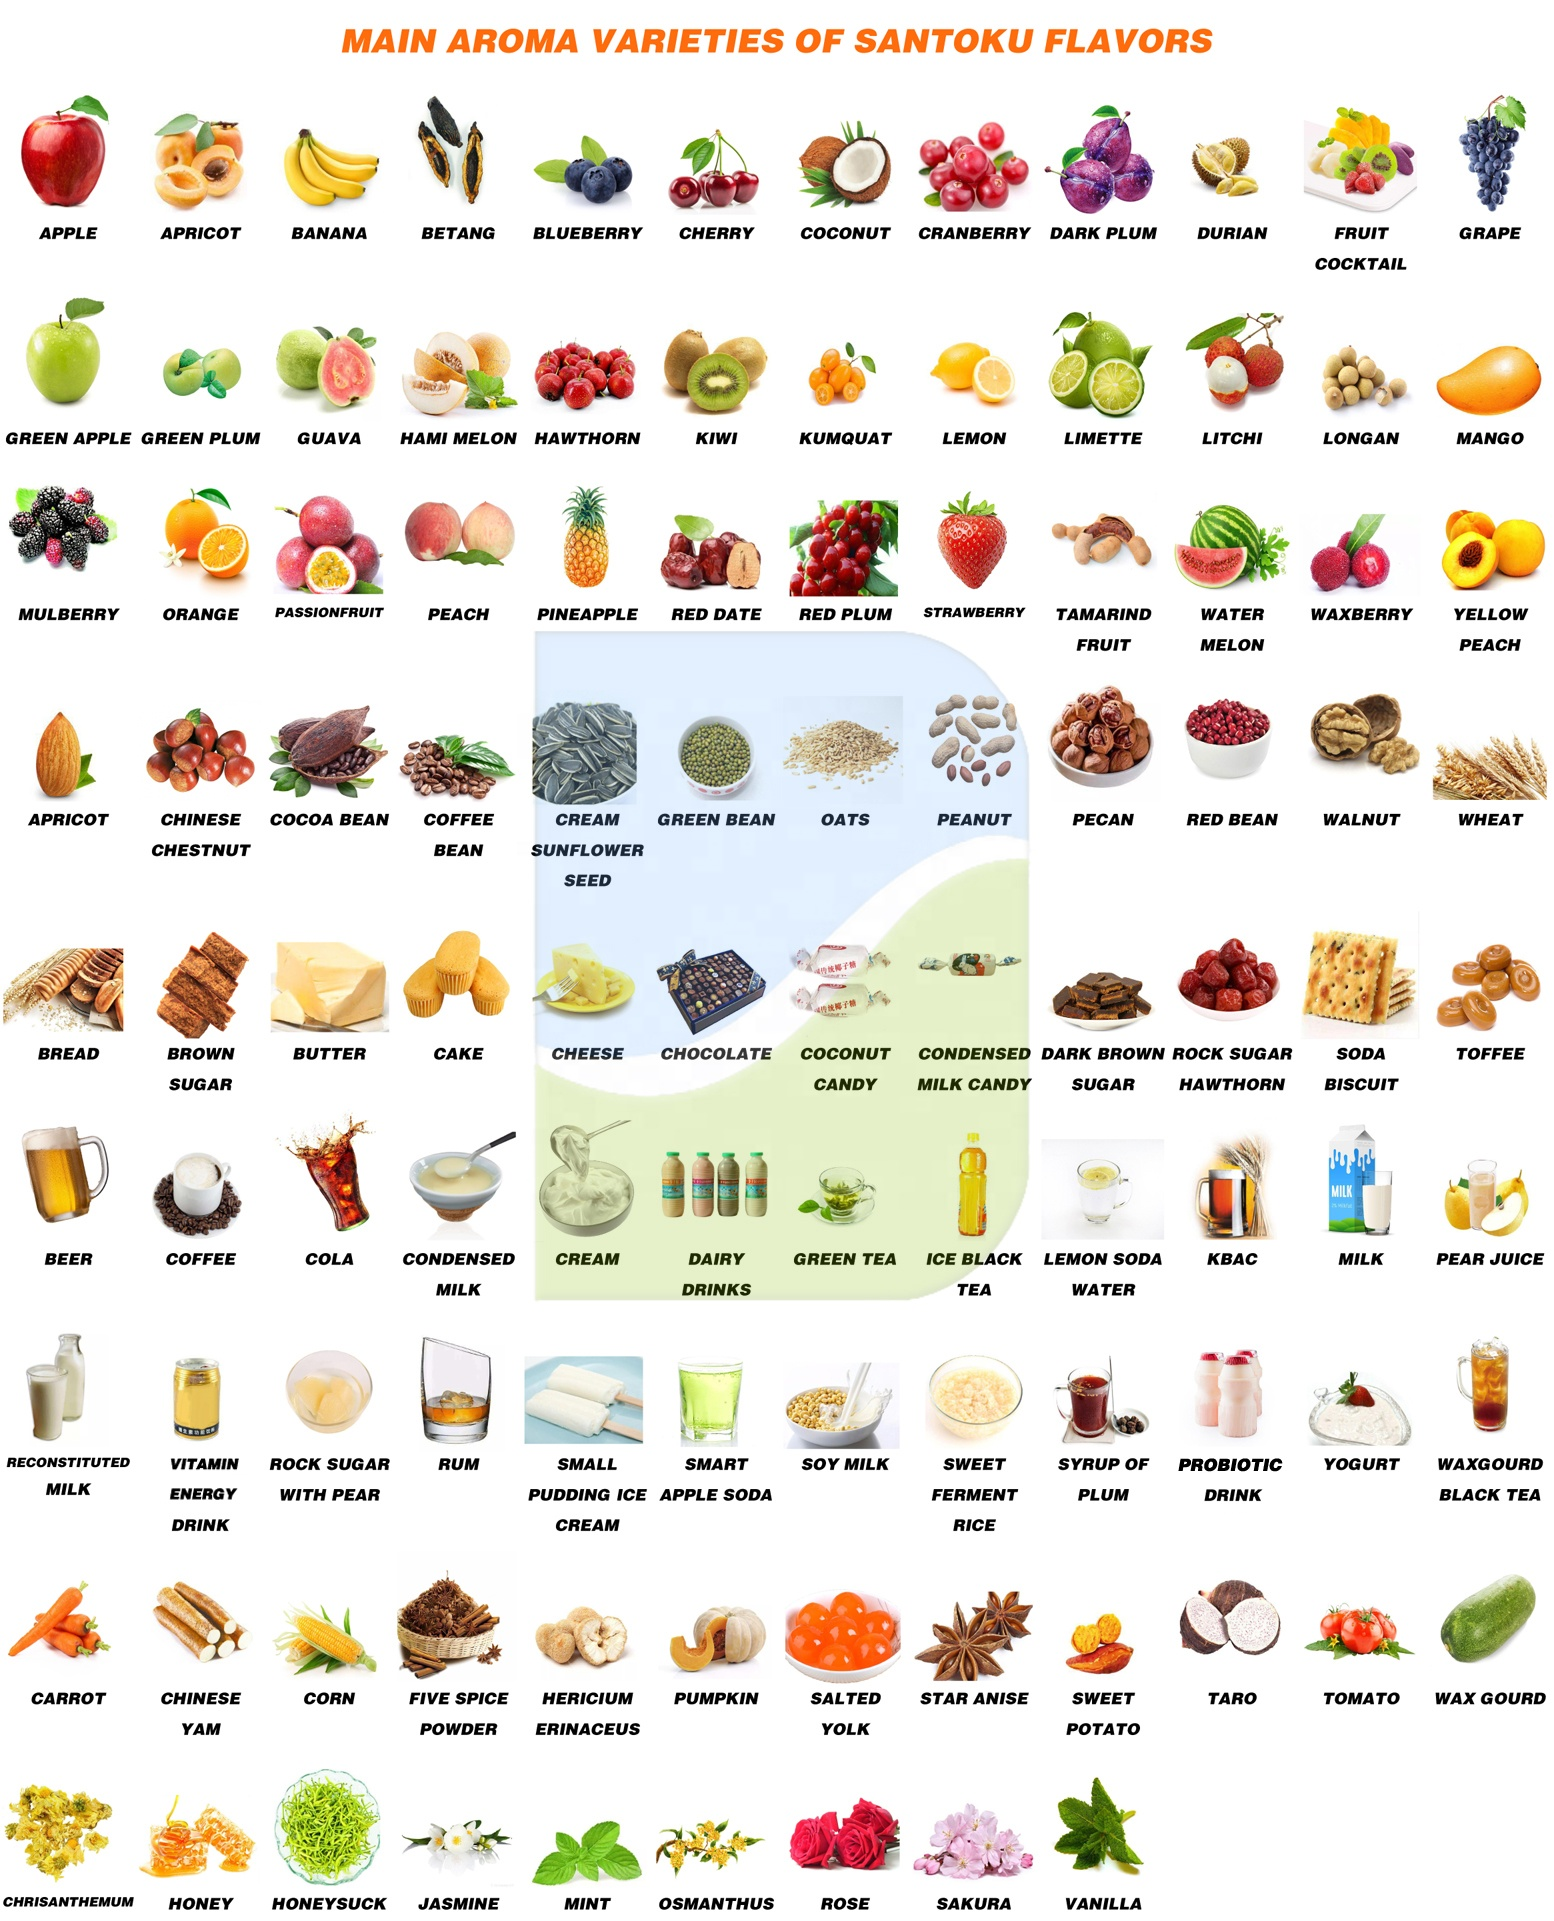 Orange liquid oil flavor/ fragrance concentrate SD11312 for Dairy food/ beverages/ juice/ drink